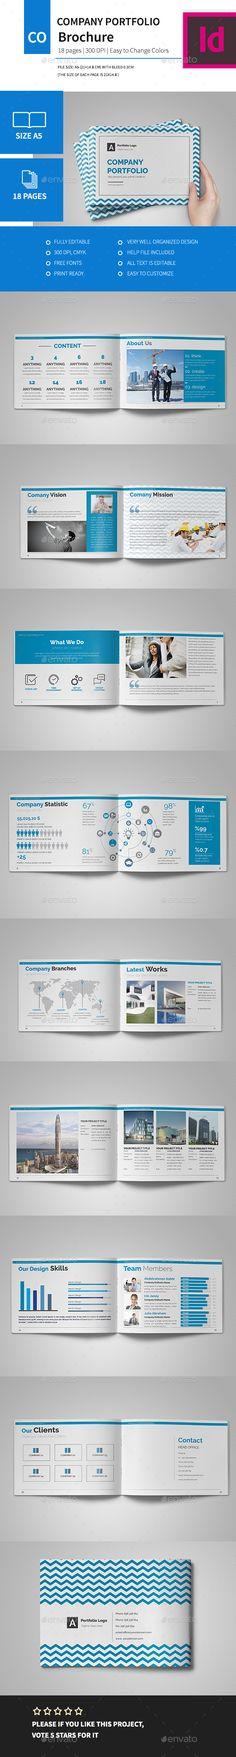 Company Portfolio Brochure 2016 Template InDesign INDD #design Download: http://graphicriver.net/item/company-portfolio-brochure-2016/14067842?ref=ksioks